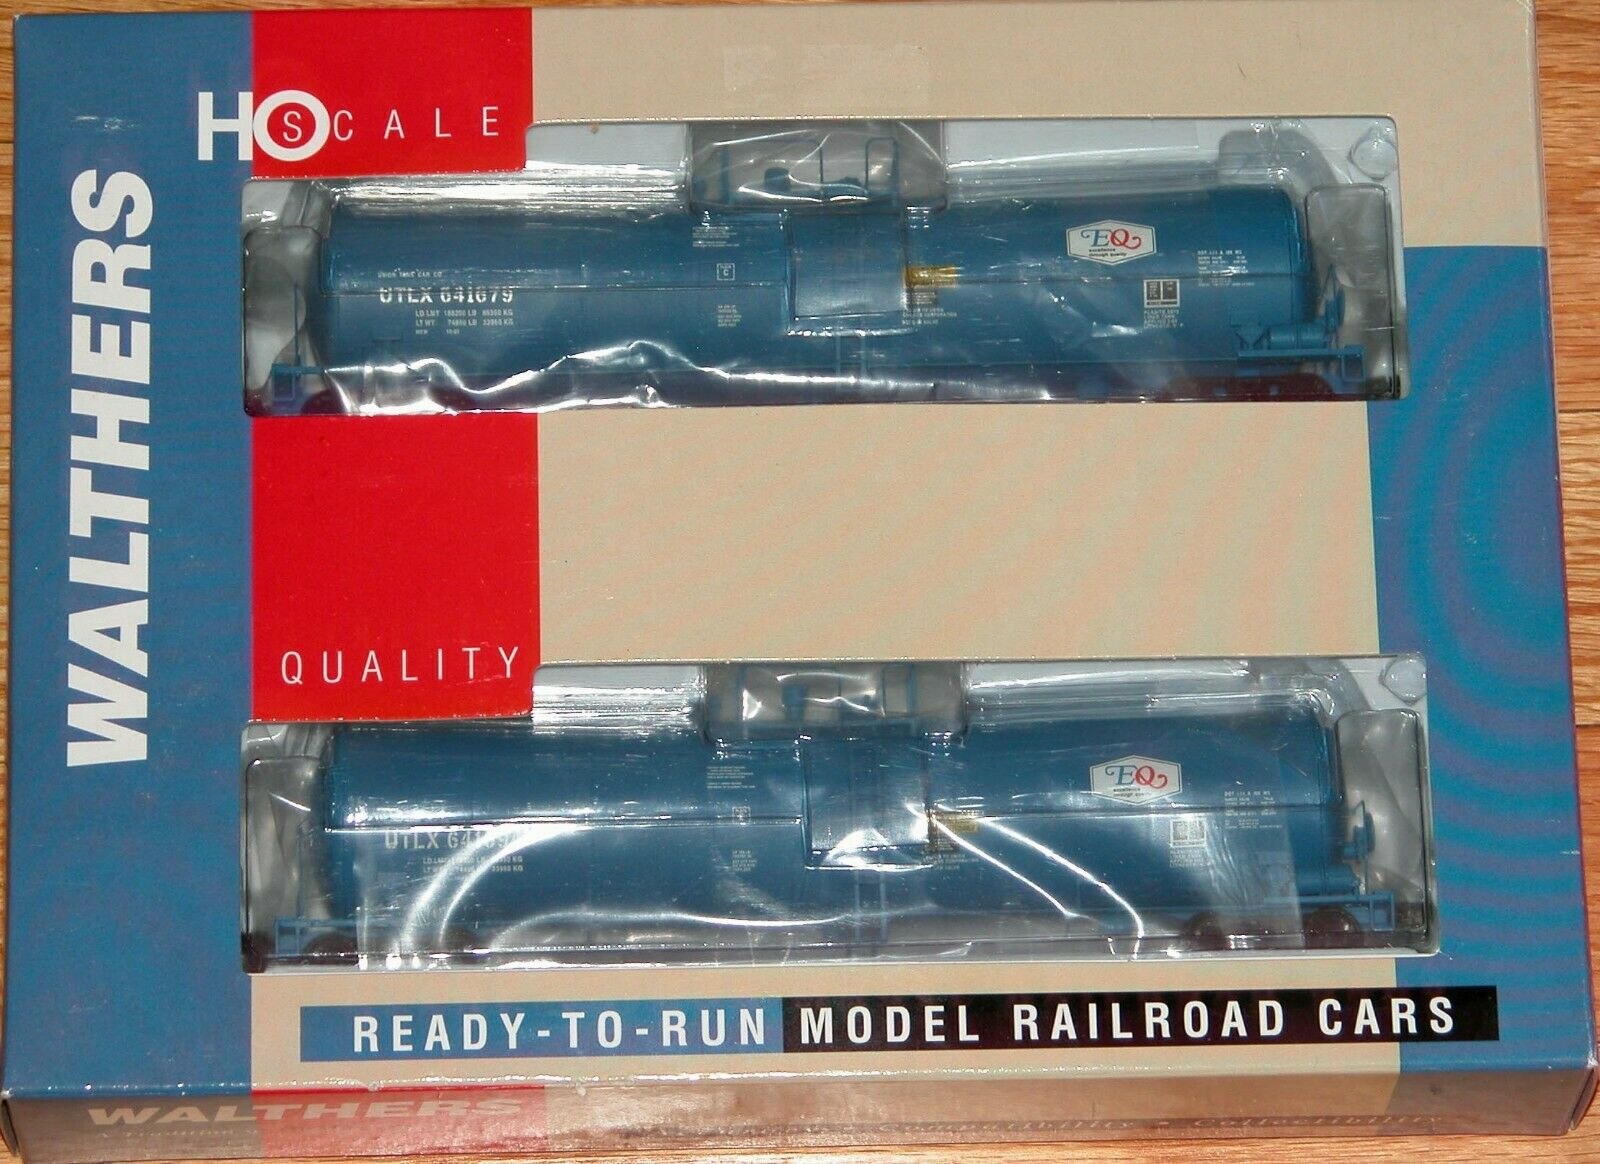 WALTHERS 932-27252 UTLX 23,000 GALLON FUNNEL FLOW TANK CAR 2-PK EQ UTLX blu